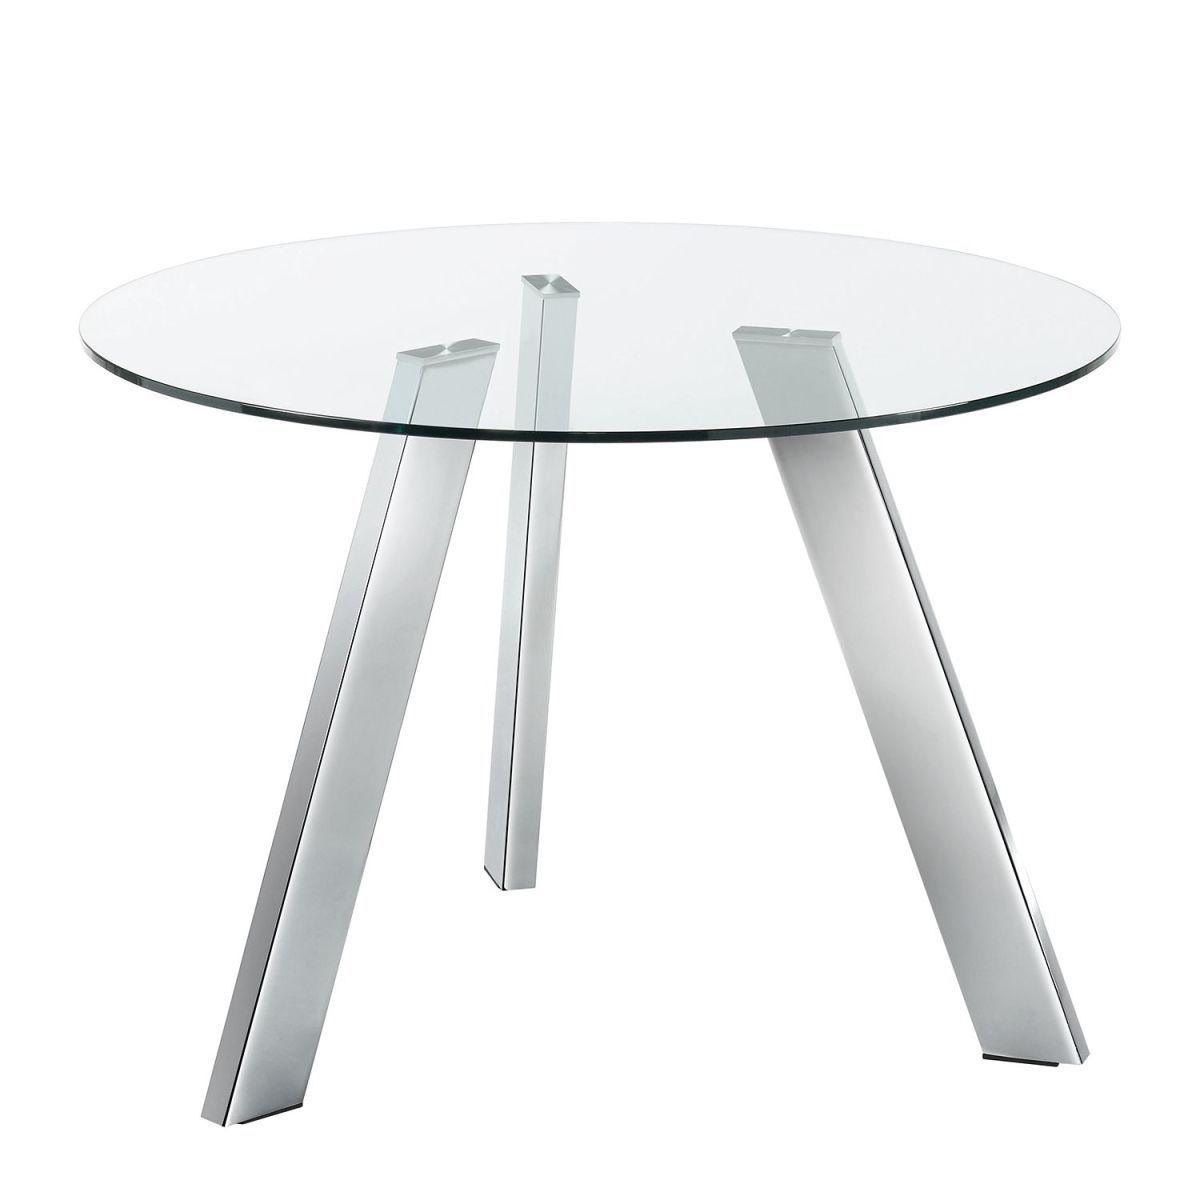 Esstisch Lolove - Glas / Stahl - Chrom - Ø 110 cm, Fredriks Jetzt ...